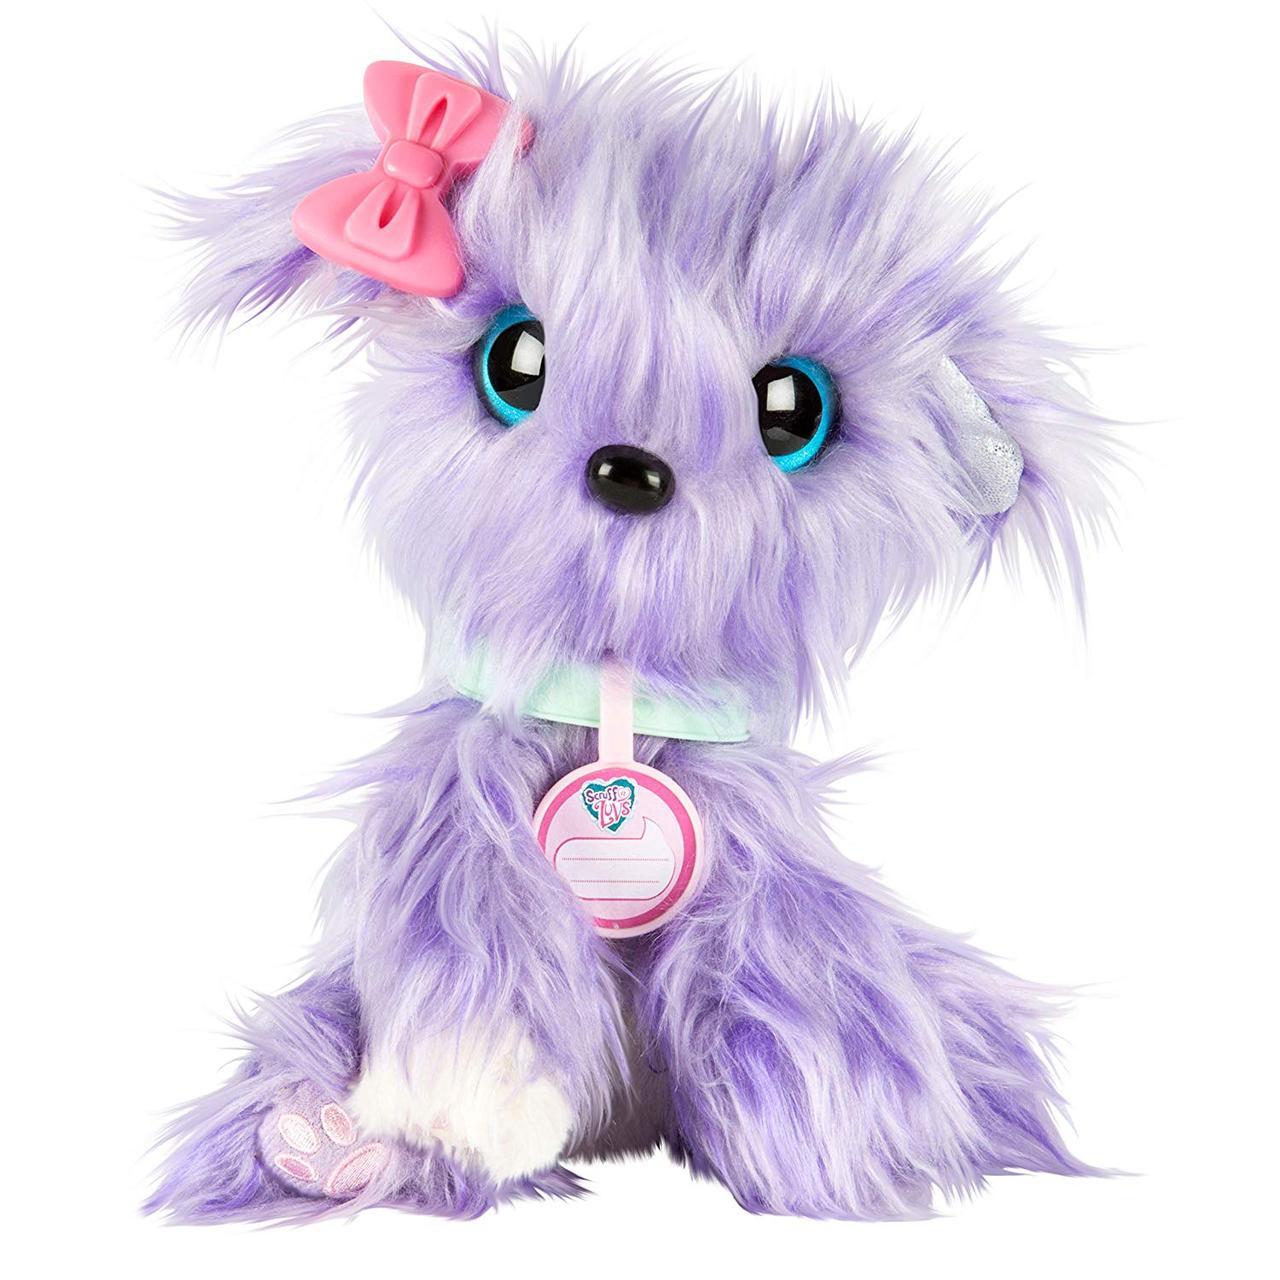 Little Live Вихованець сюрприз Няшка блукаюча зурка Фіолетовий Scruff-a-Luvs plush mystery rescue pet Purple